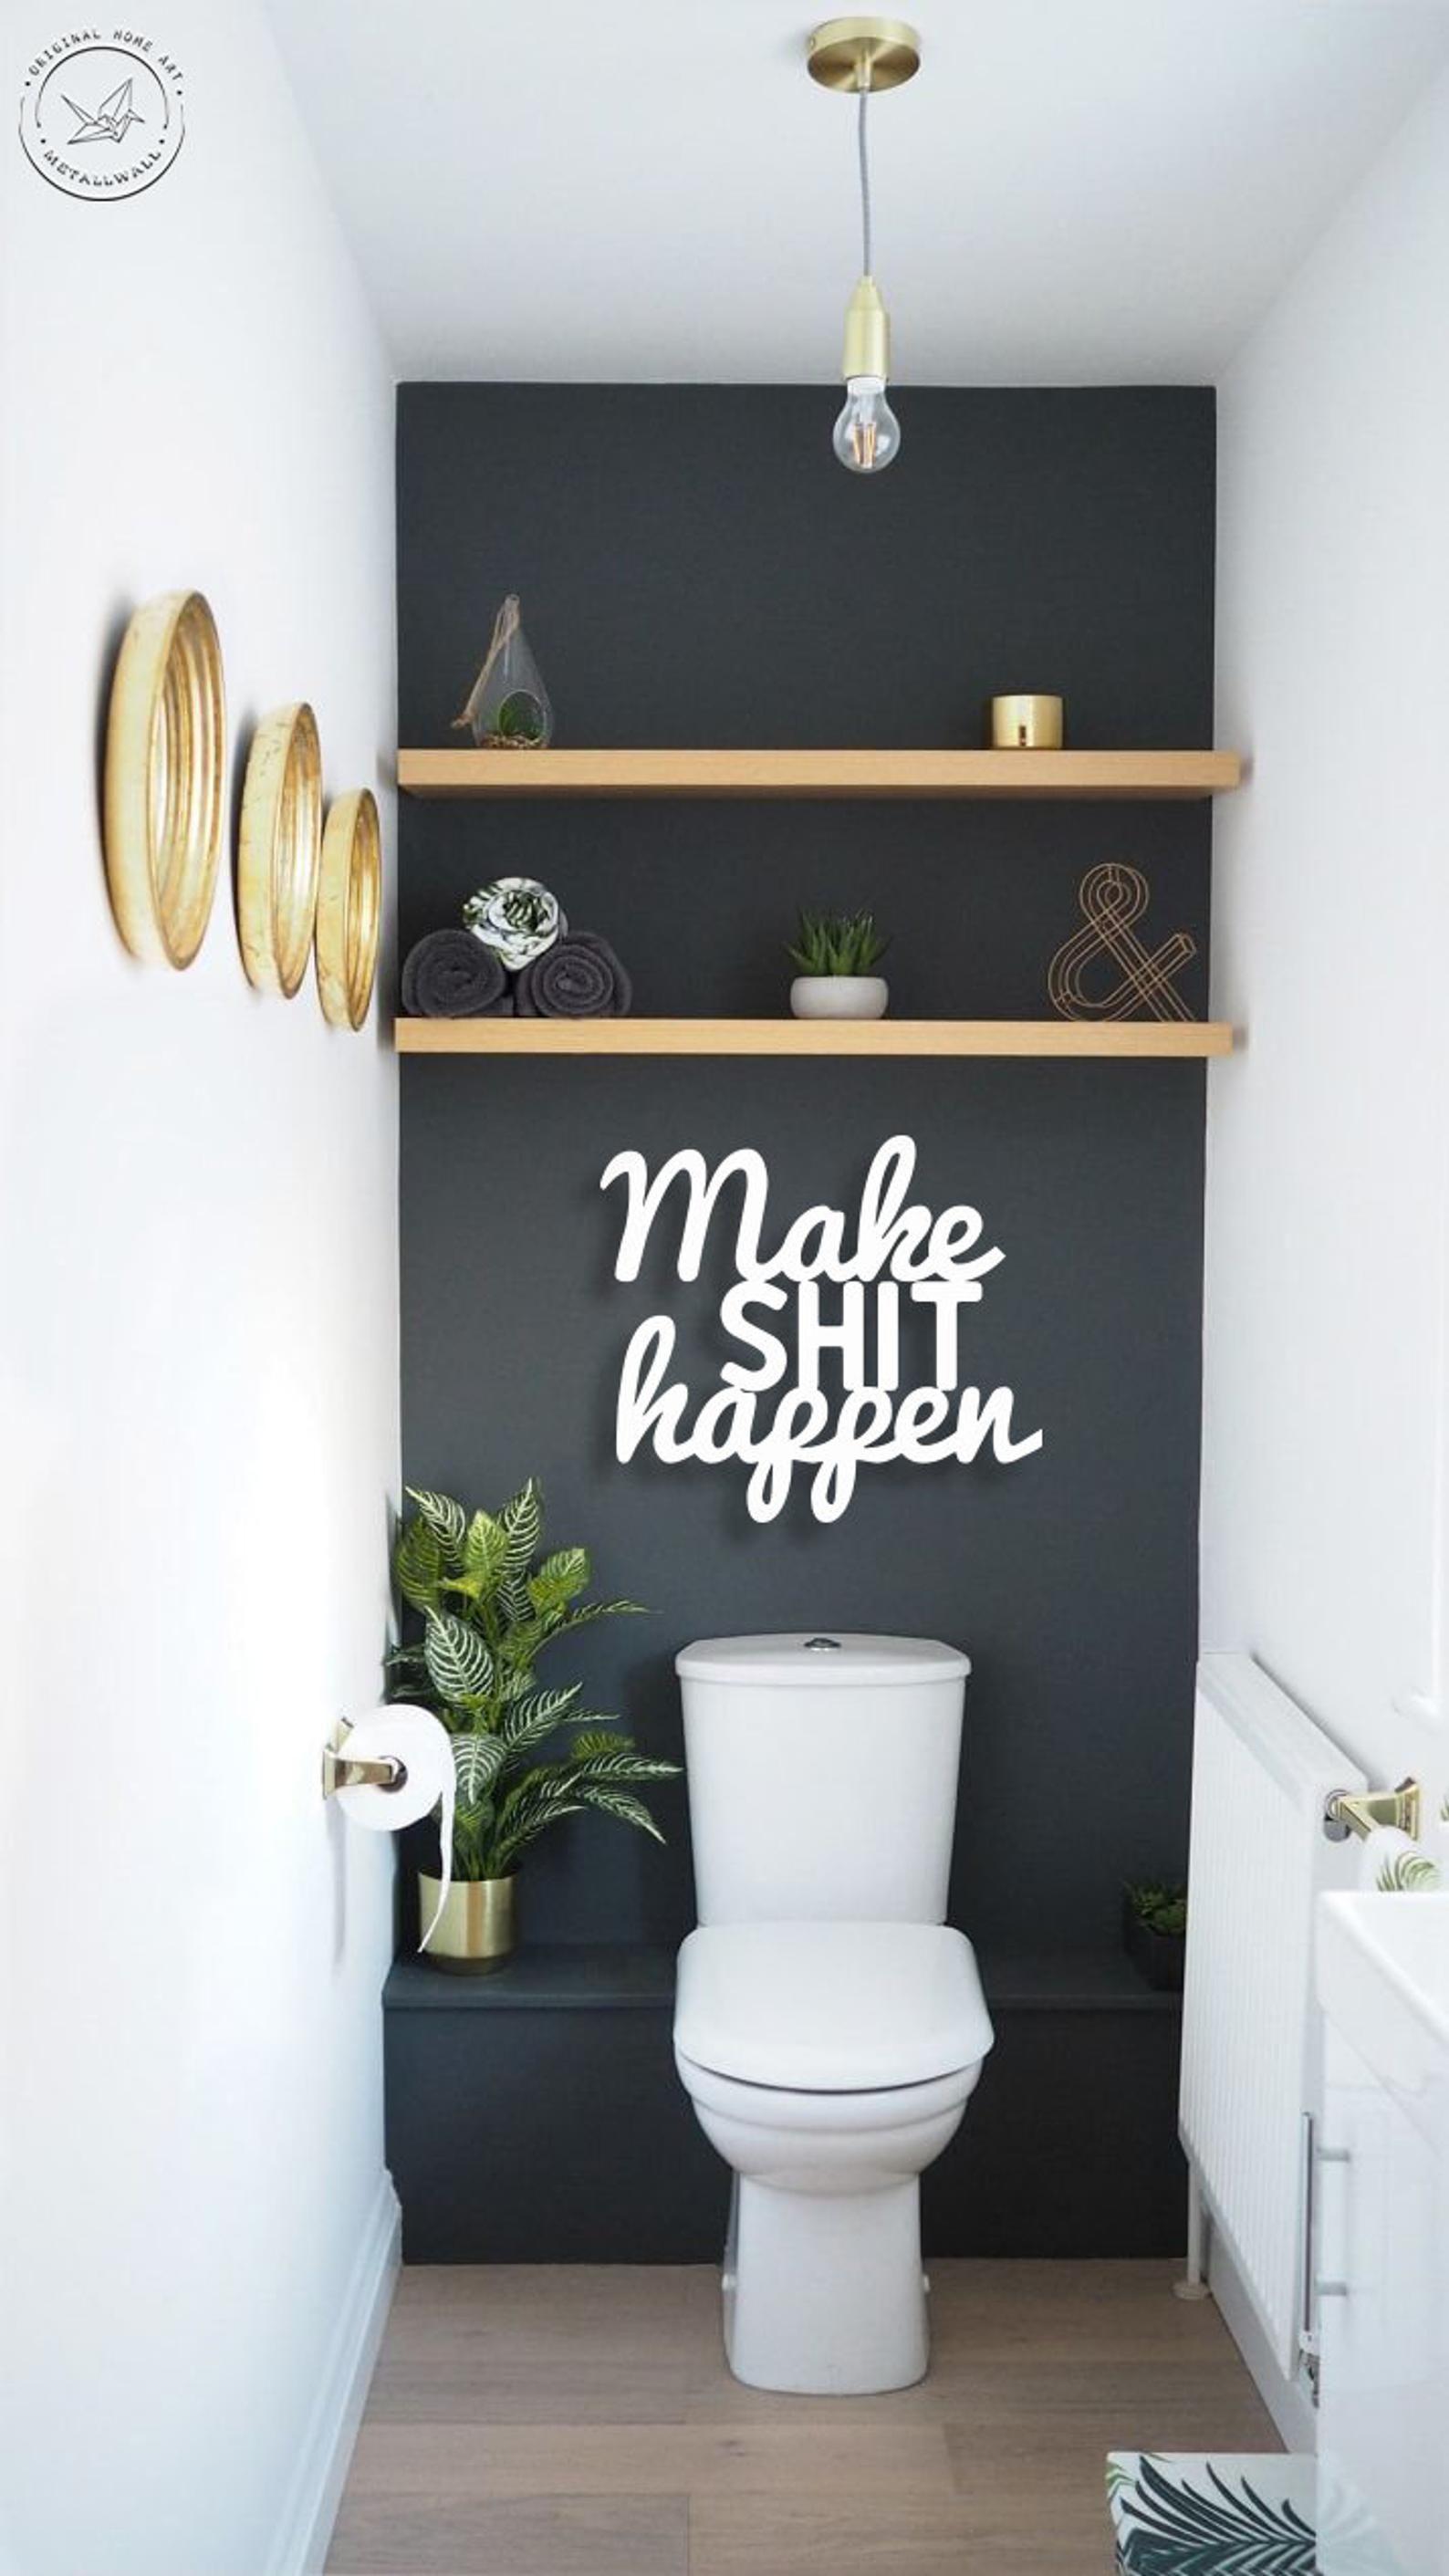 Make Shit Happen Metal Letters Wall Art Bathroom Wall Art Etsy Bathroom Wall Decor Metal Wall Letters Metal Letter Wall Art